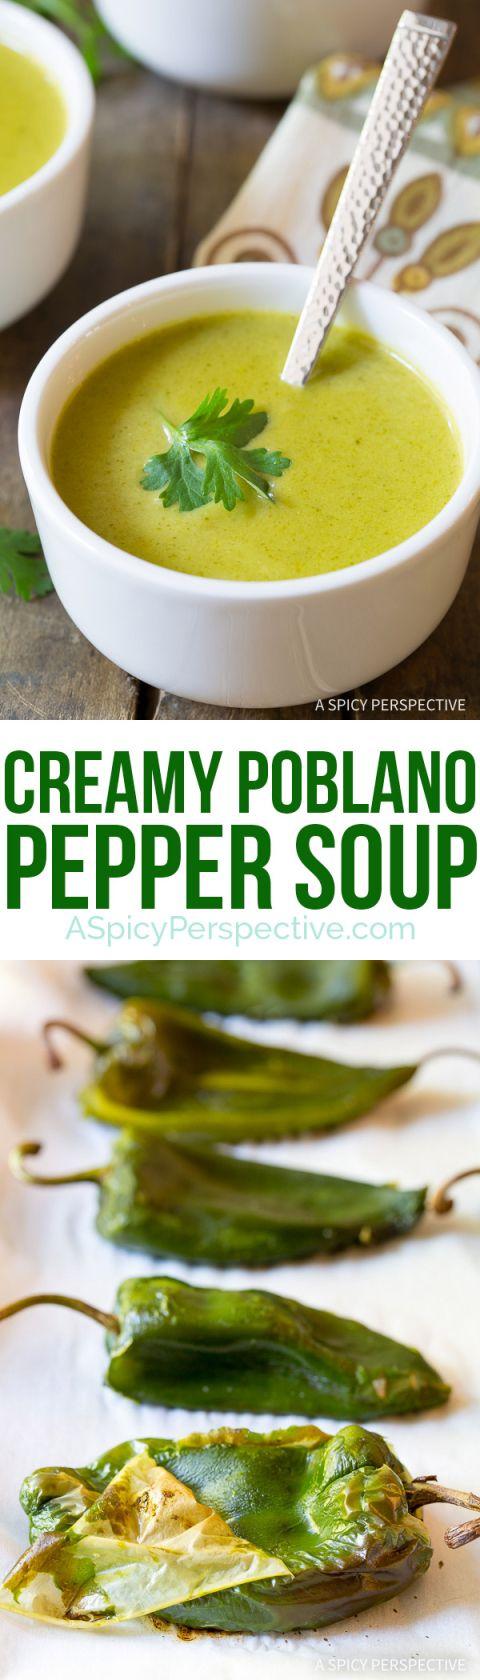 Mild and Smoky - Creamy Poblano Pepper Soup Recipe on ASpicyPerspective.com